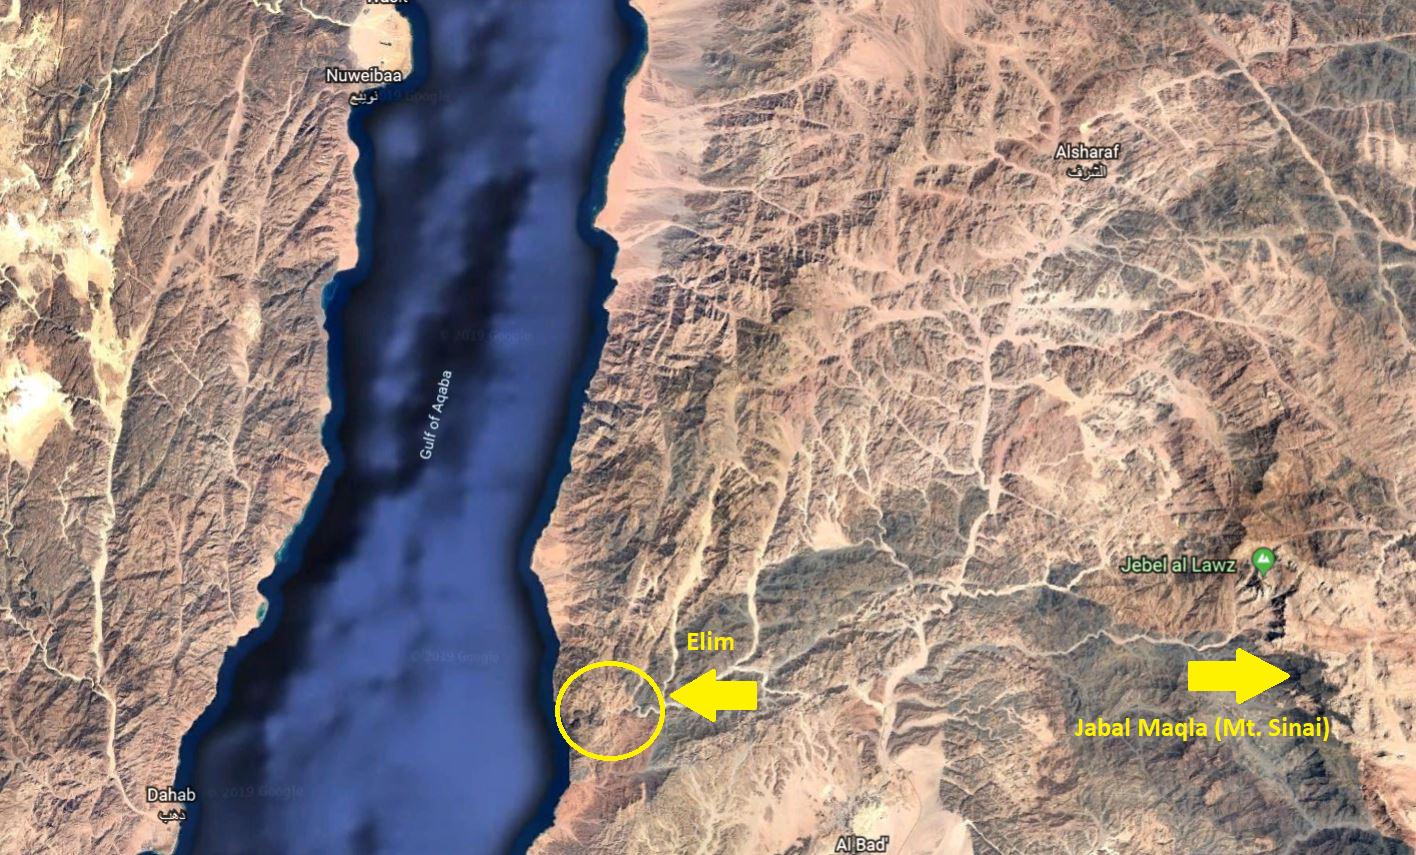 Image obtained via Google Earth.